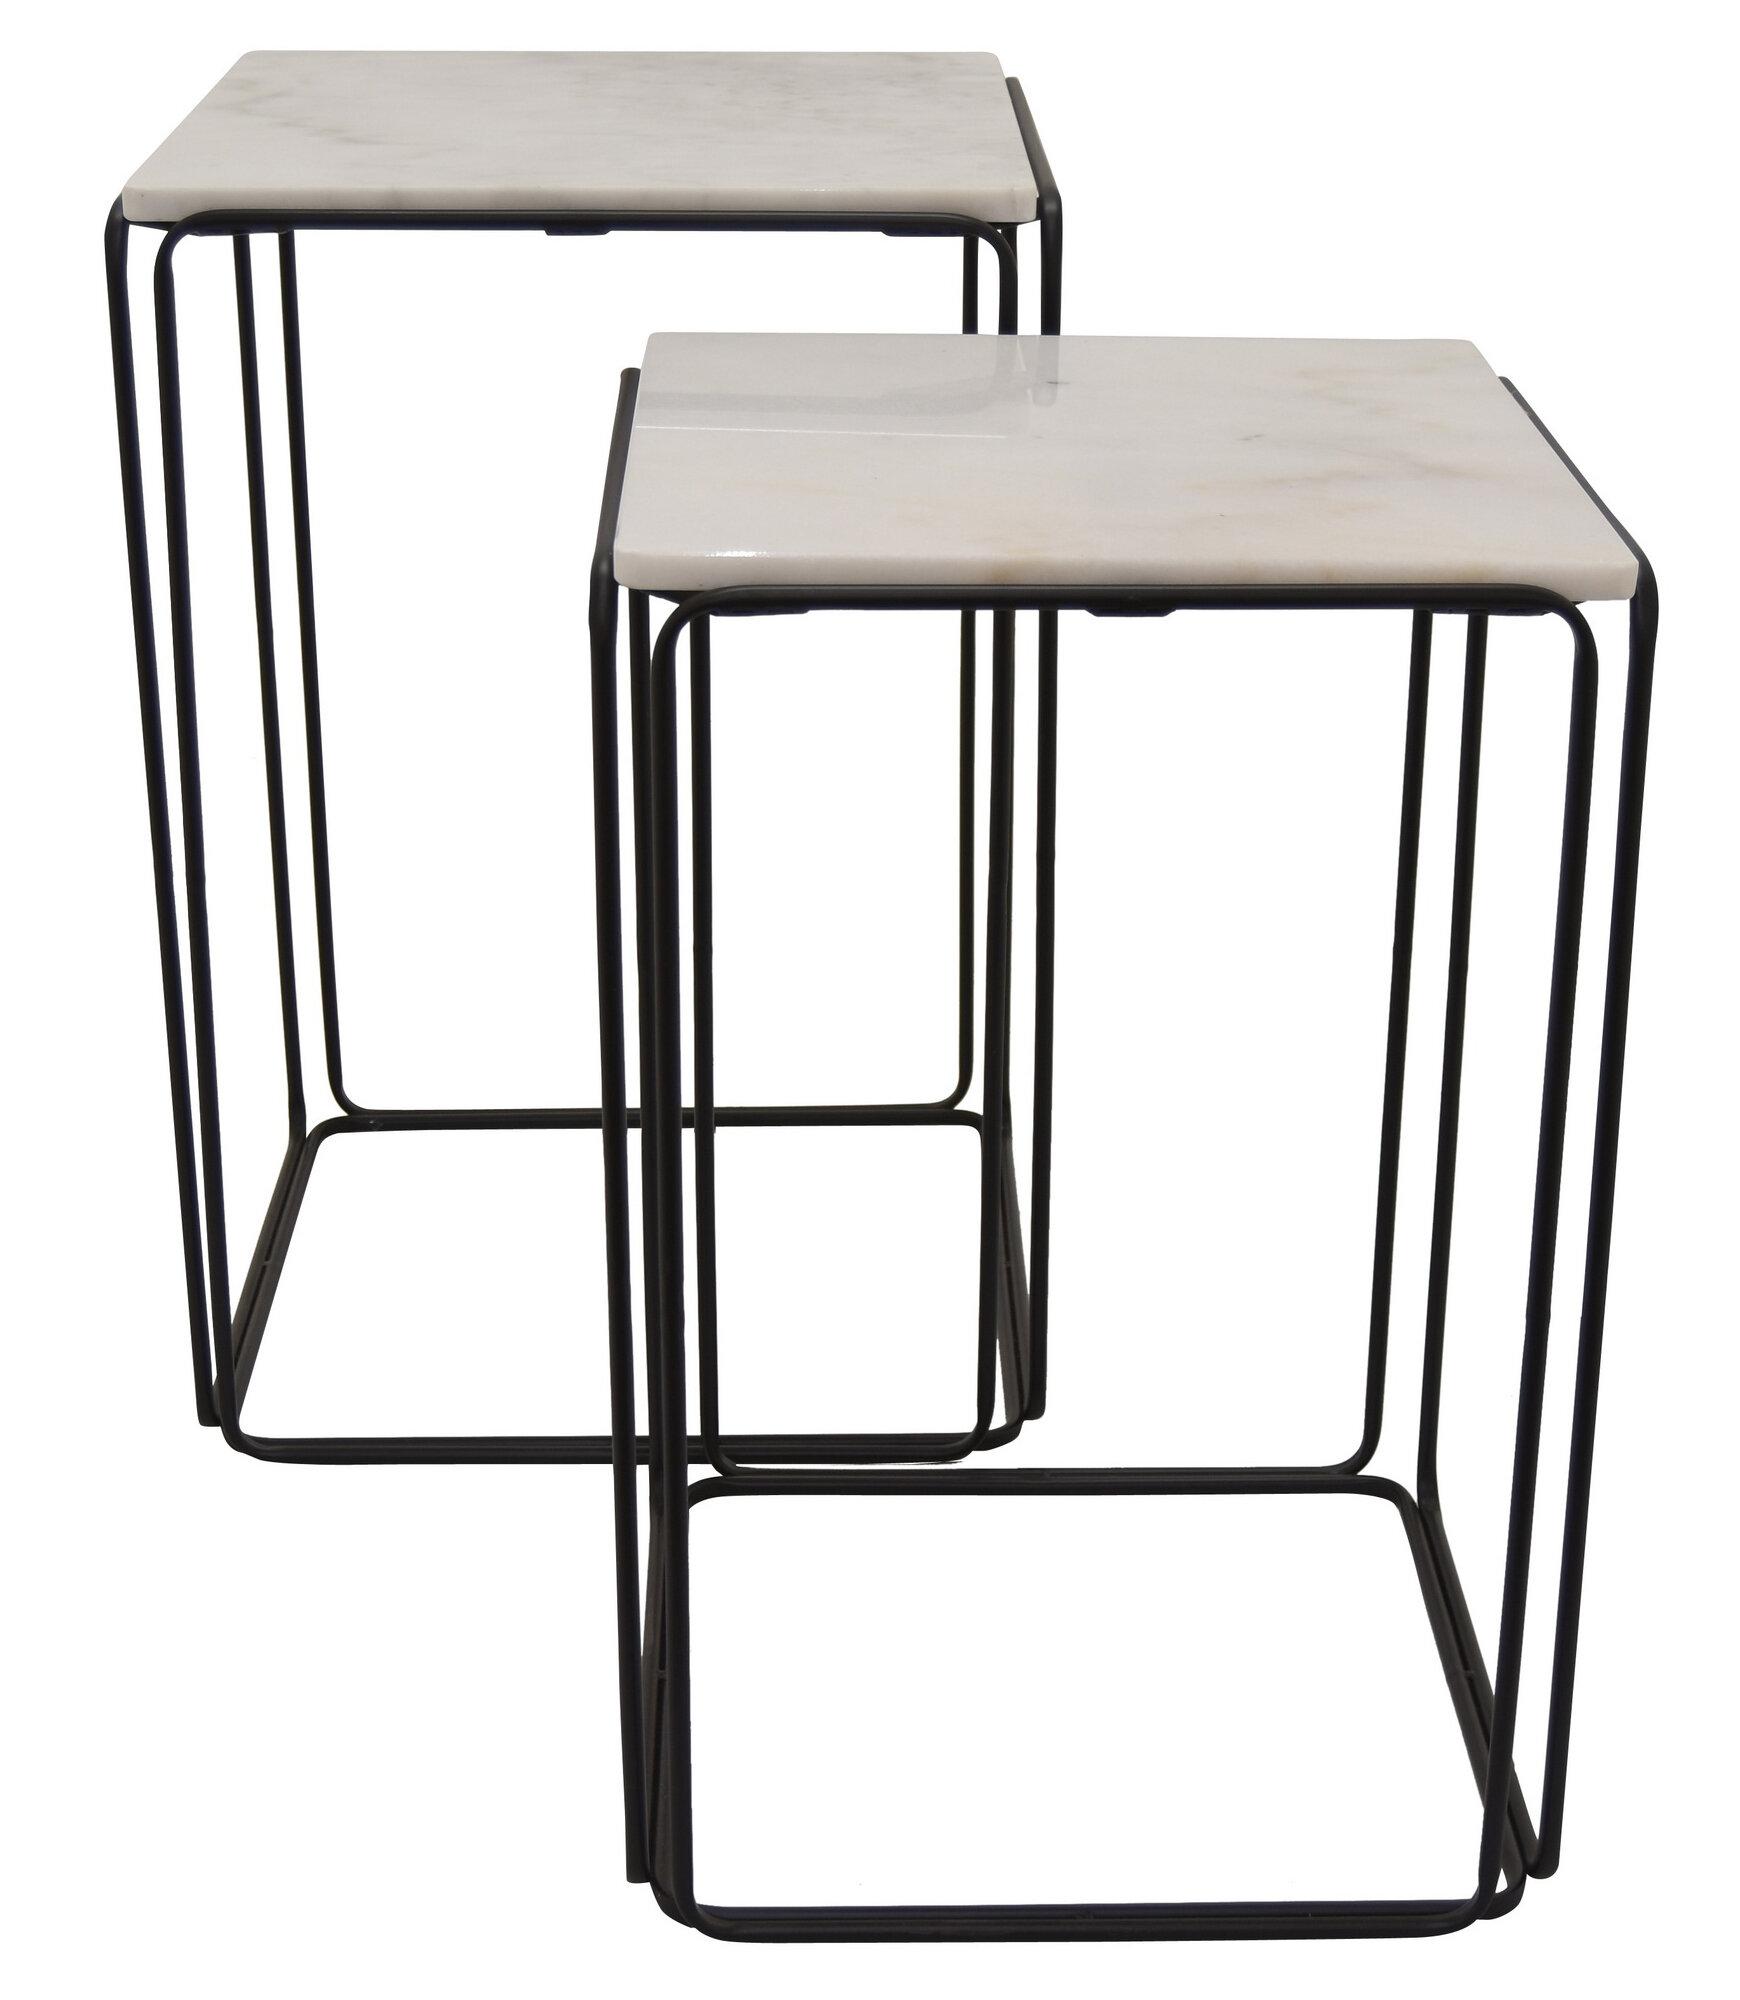 Three Hands Co Metal Marble Top Table Set Of 2 In Black 19in L X W 28in H Wayfair